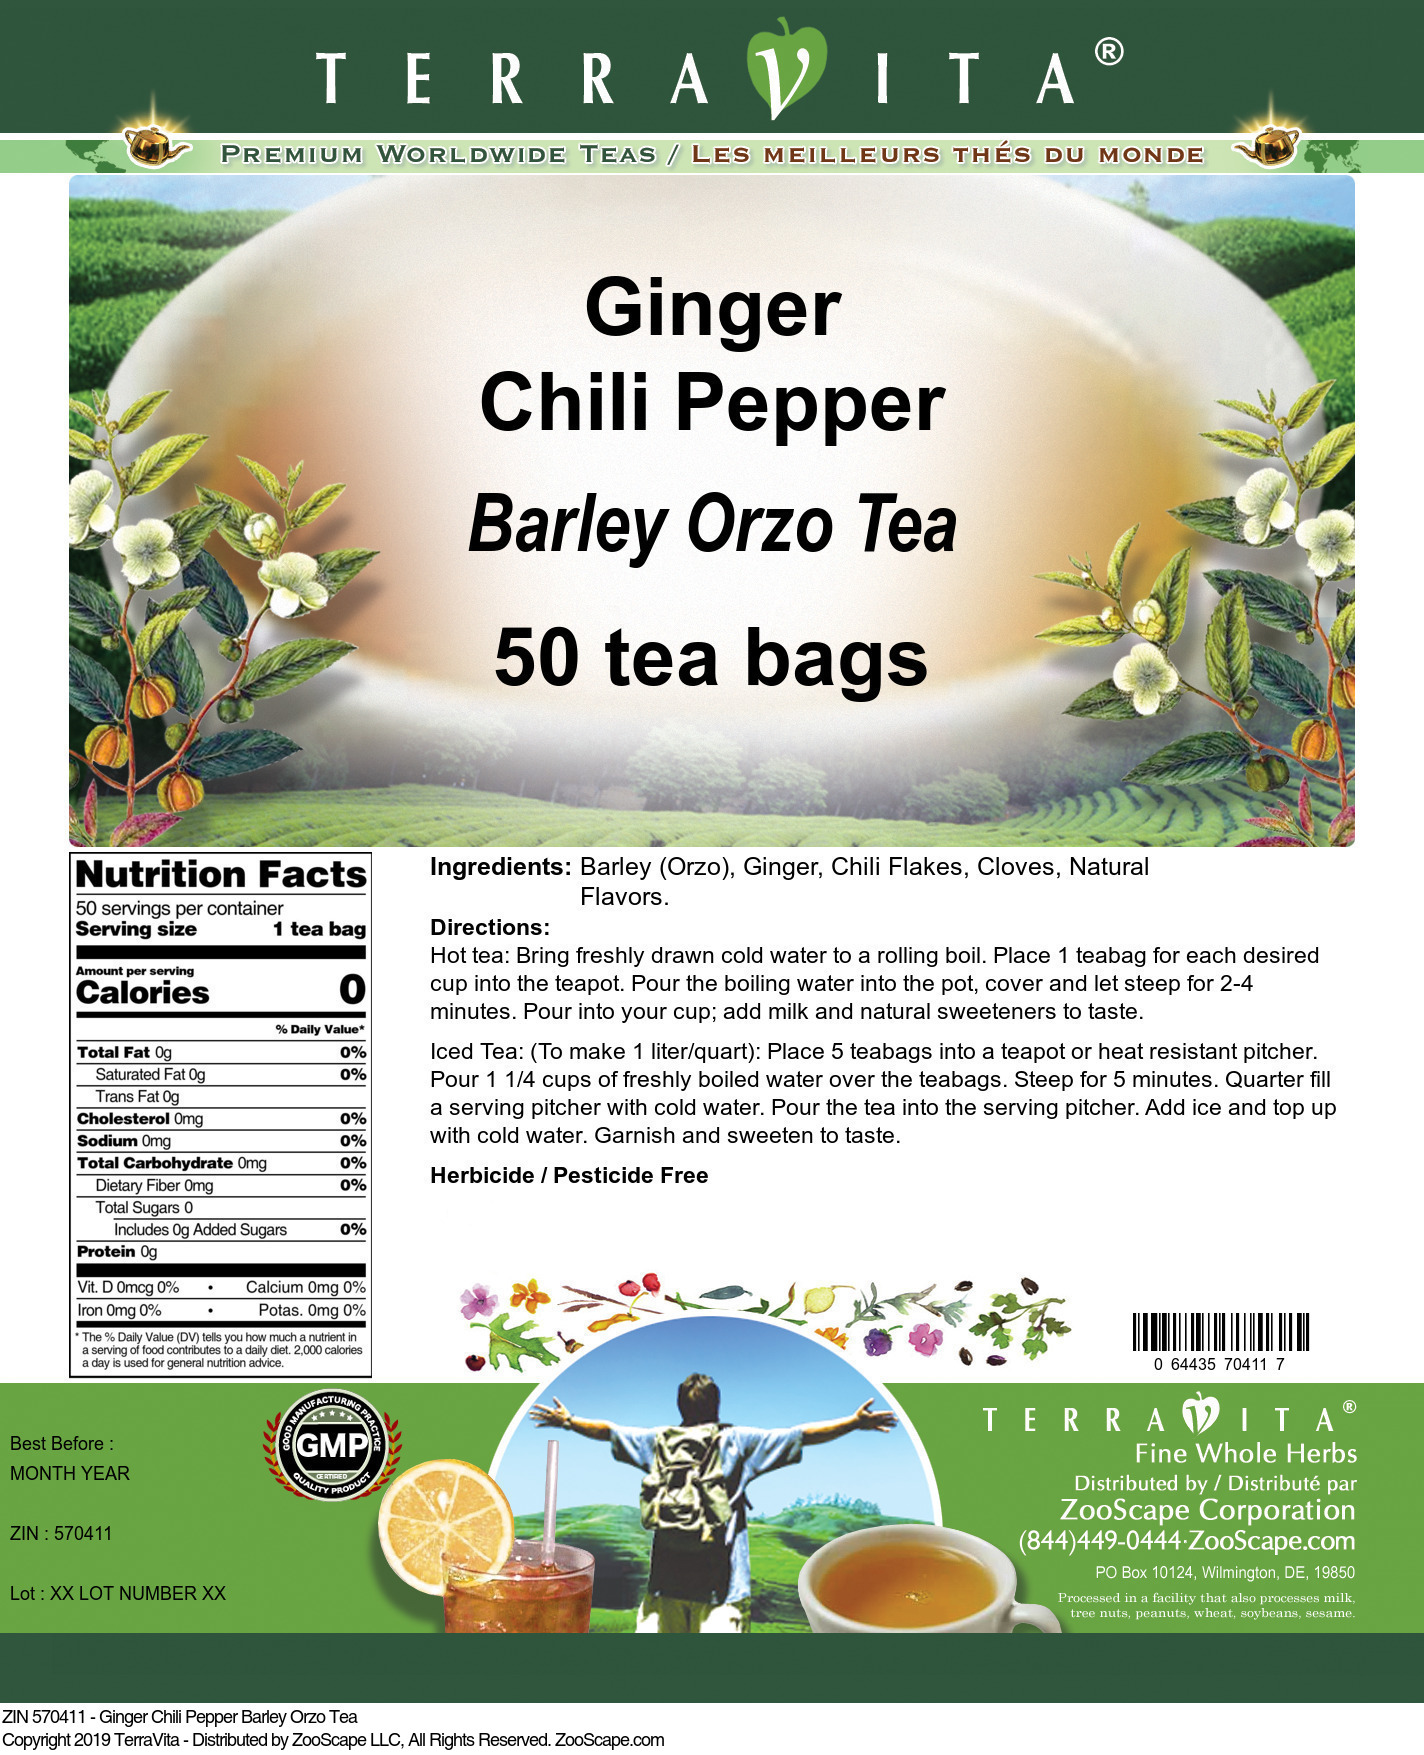 Ginger Chili Pepper Barley Orzo Tea